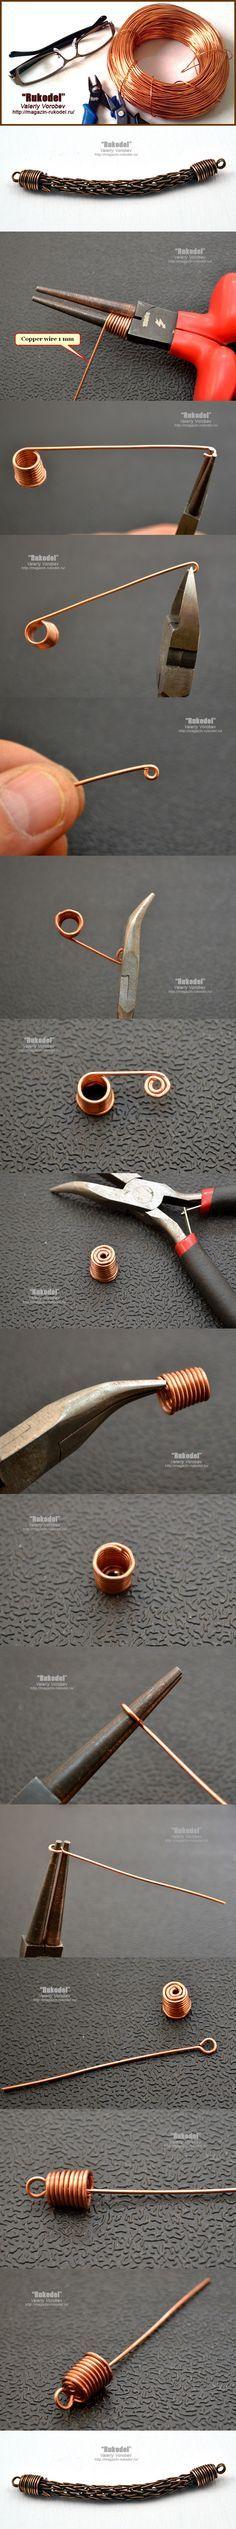 Caps of copper wire Концевики для бижутерии своими руками. | Рукодел